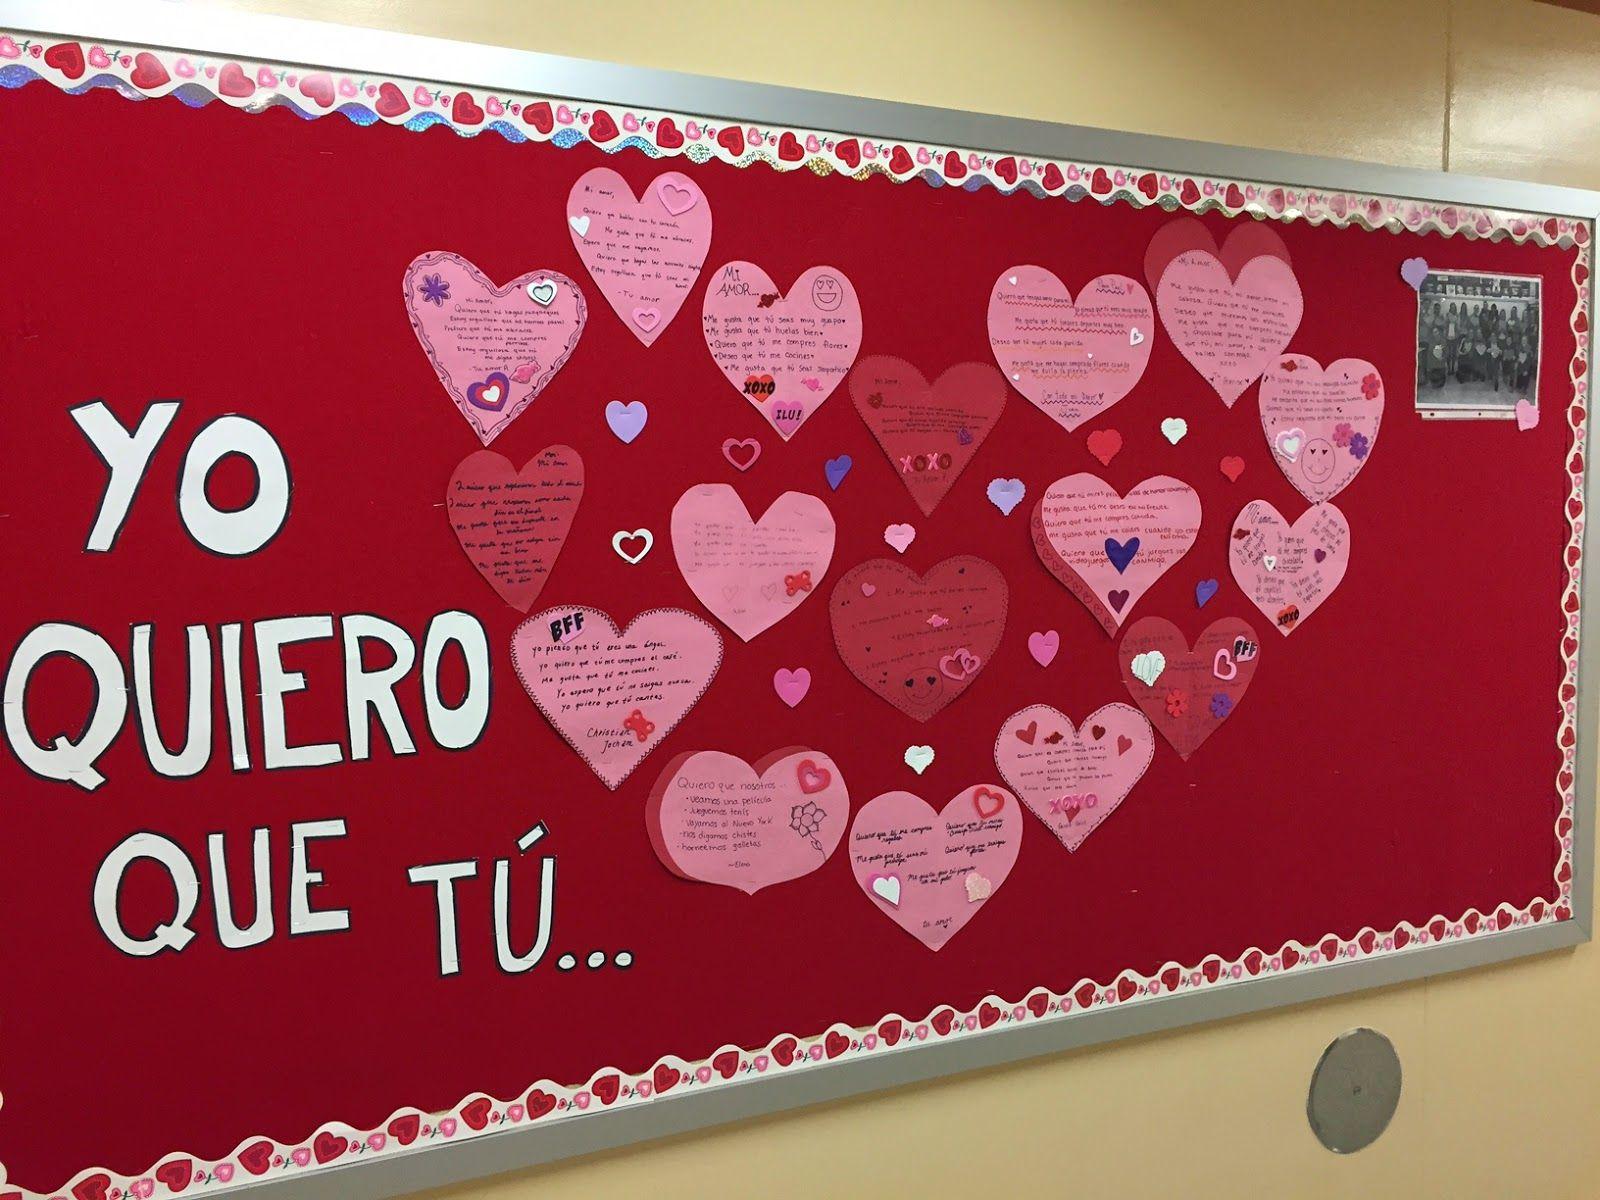 Subjunctive Hearts